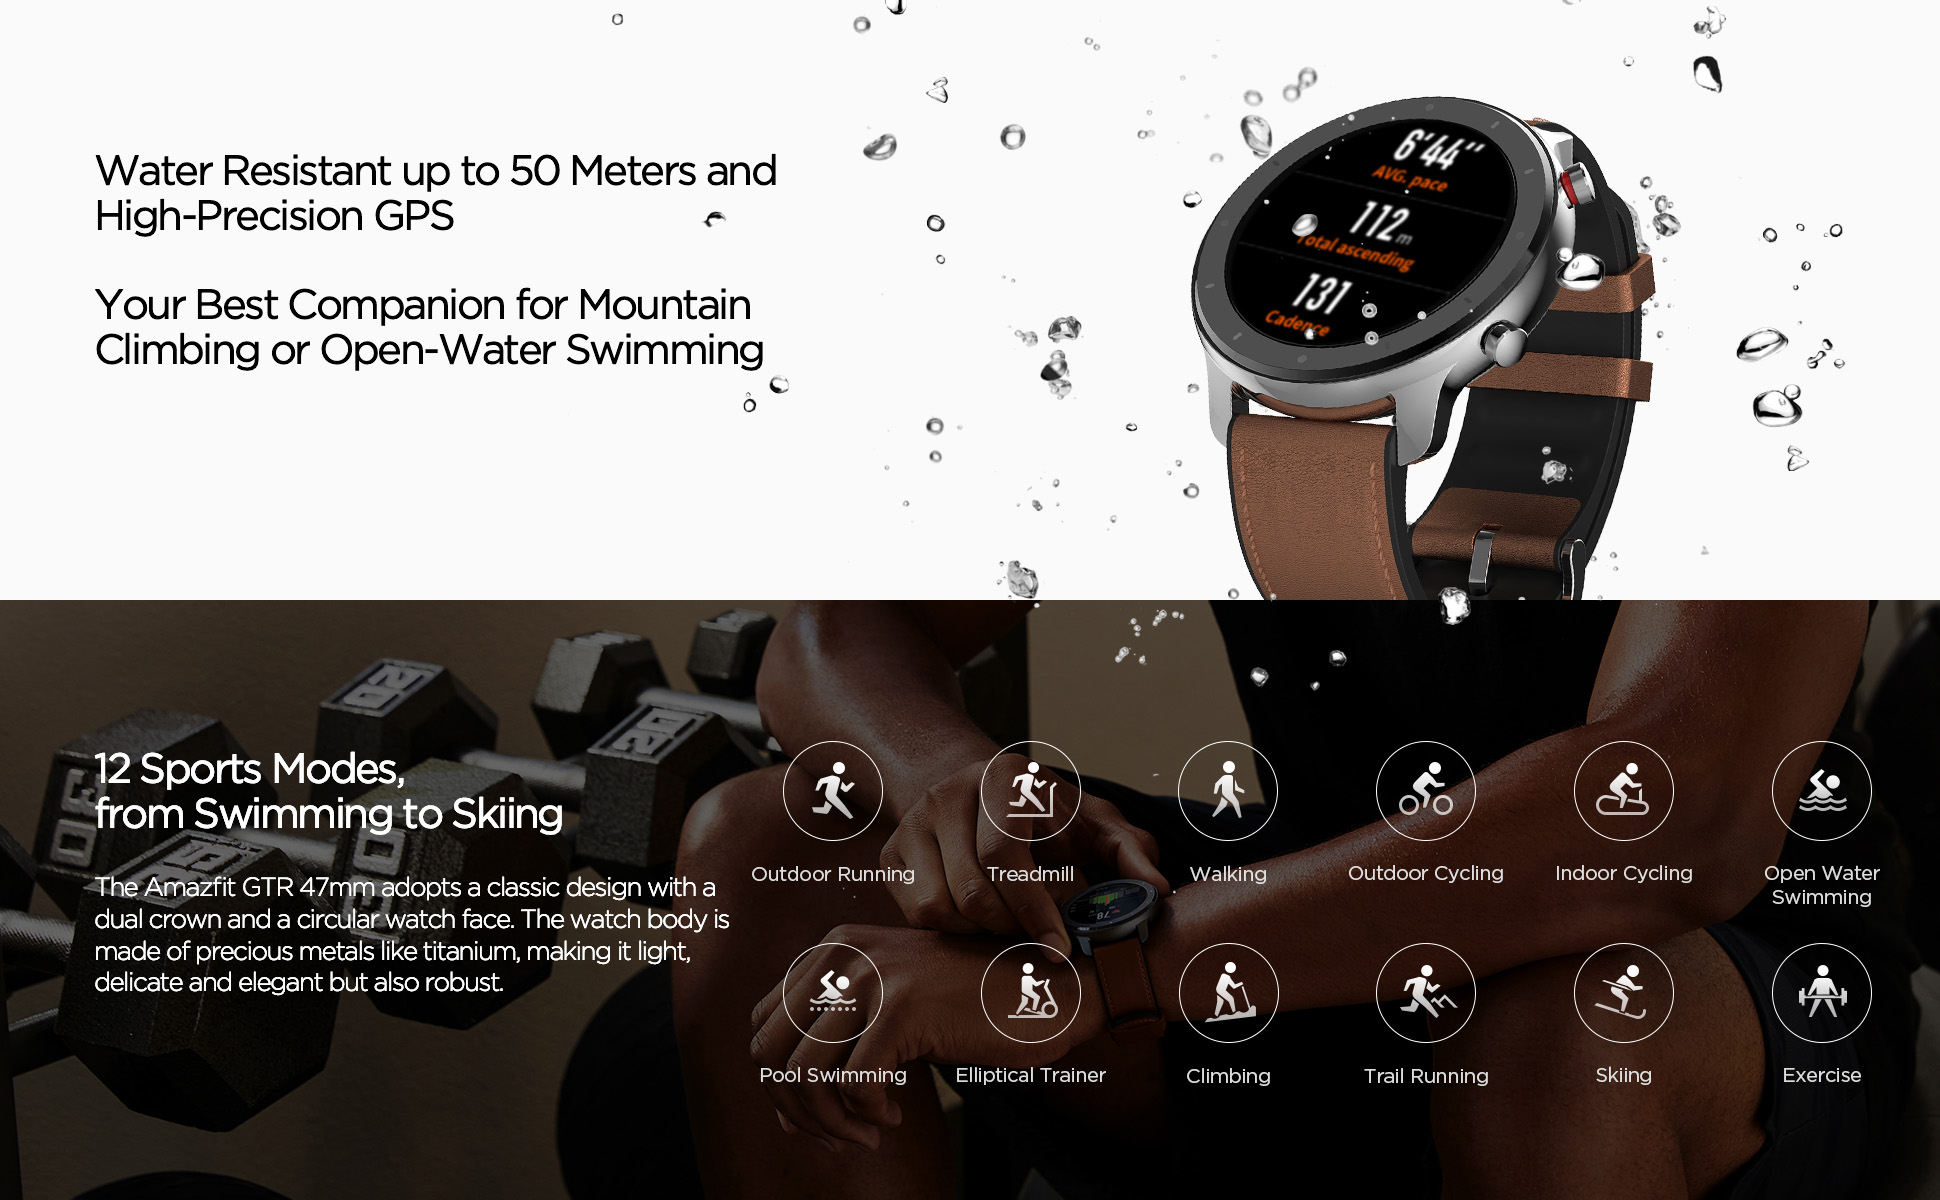 ساعت هوشمند شیائومی مدل Amazfit GTR Amazfit GTR